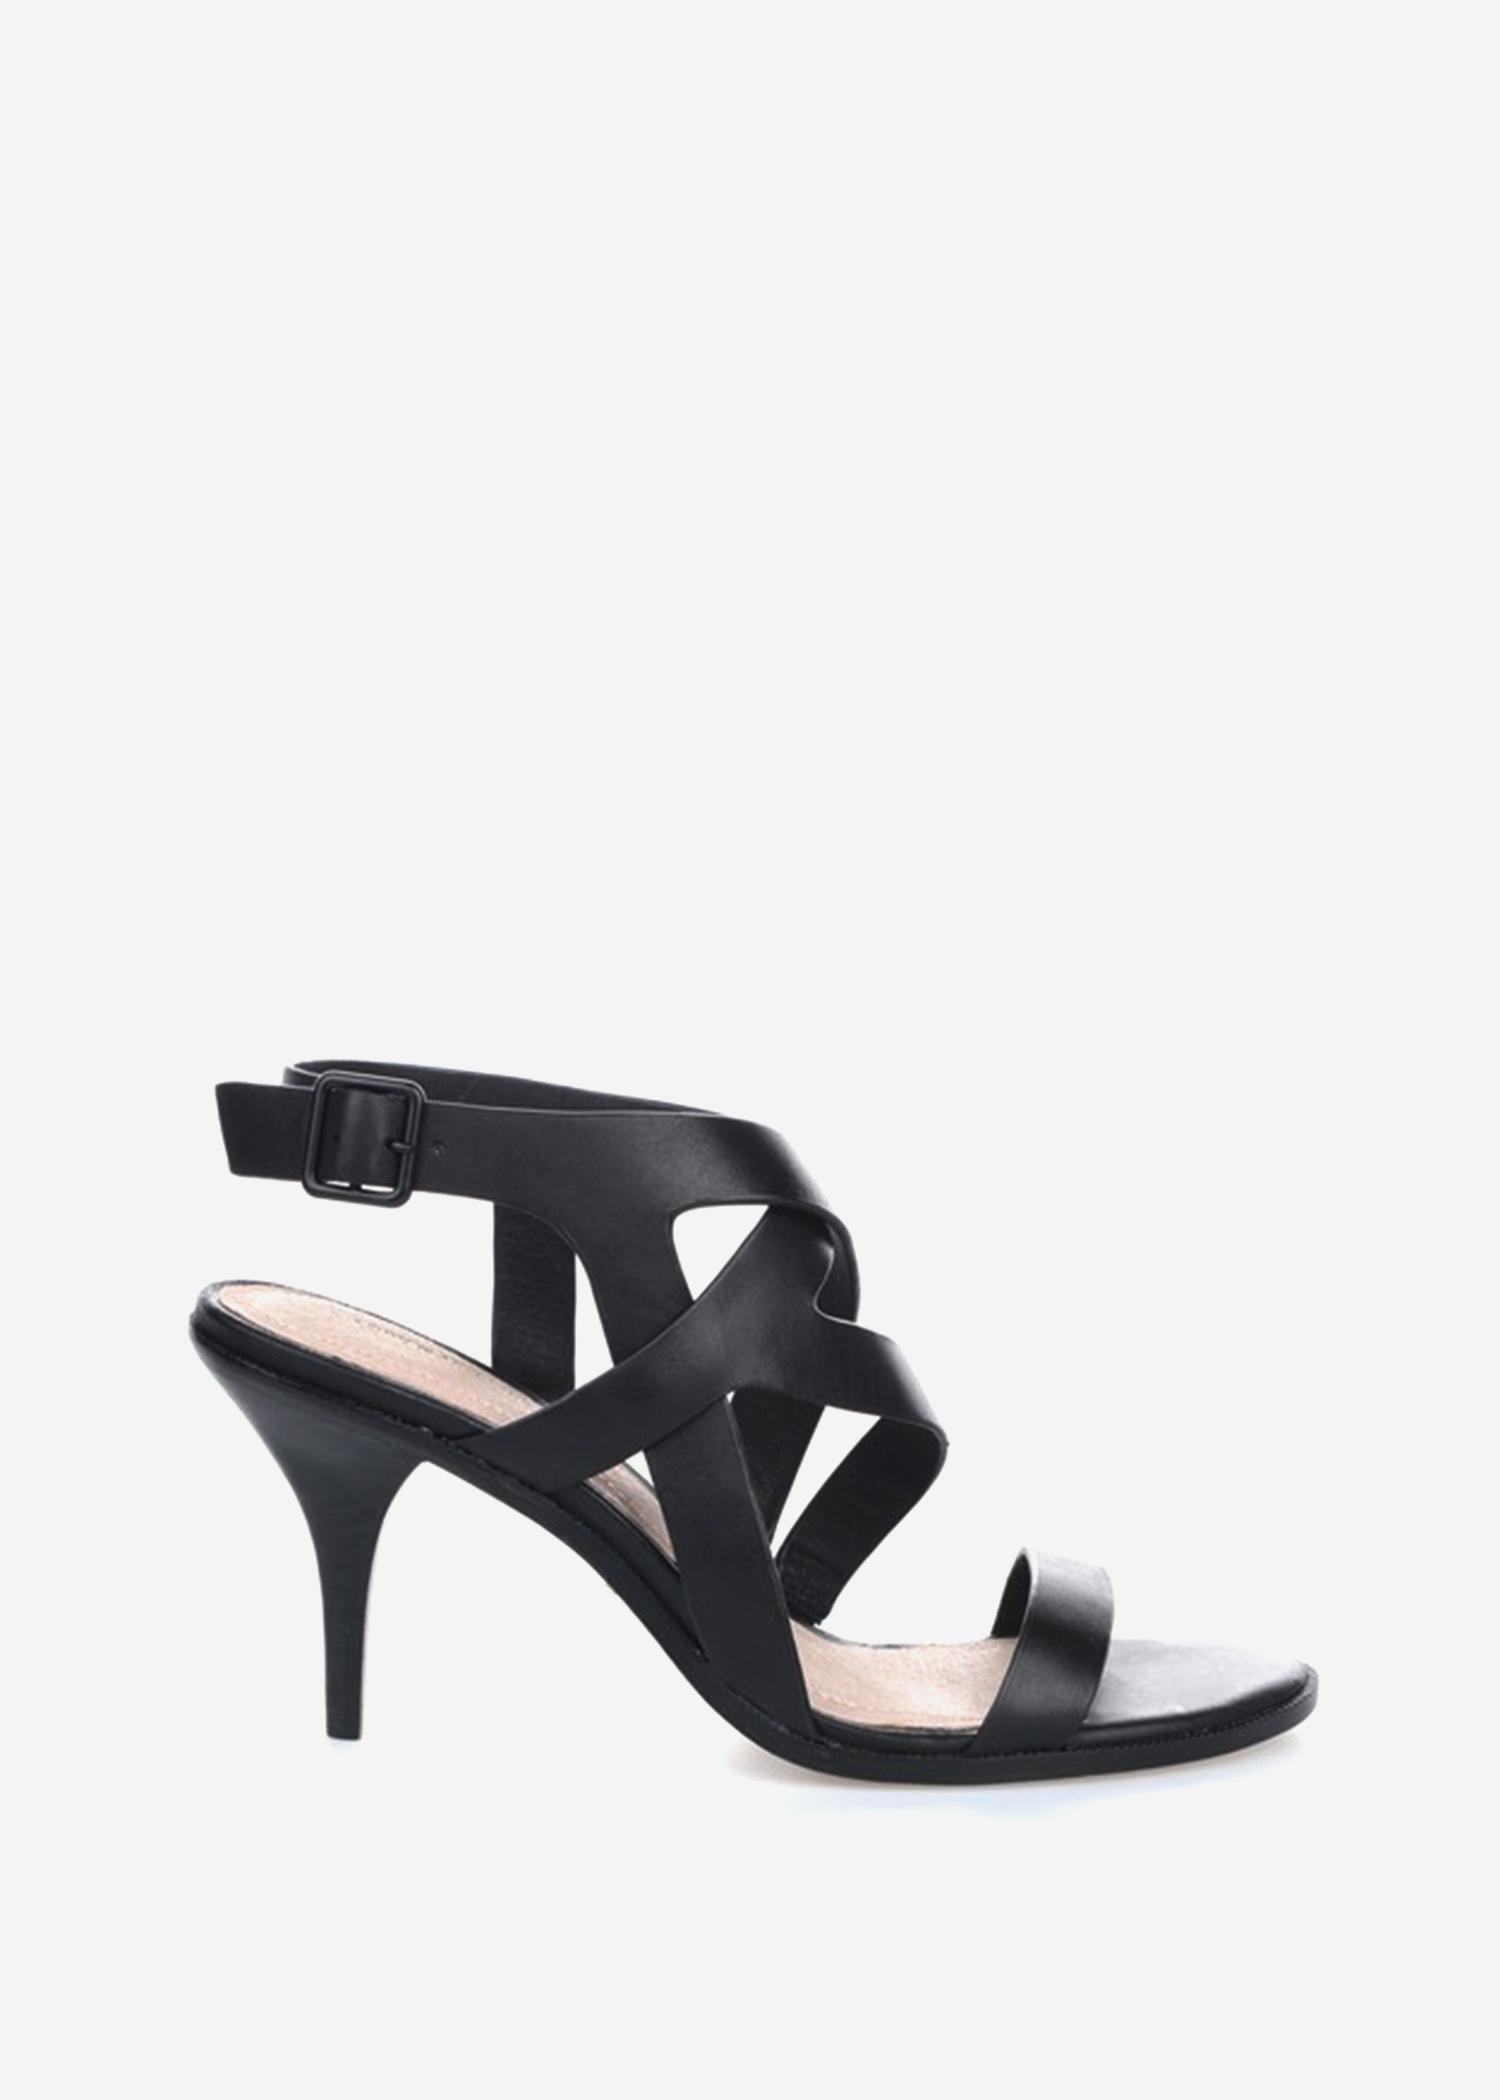 f866c6431a4af9 Lyst - Pour La Victoire Maura Dress Sandal in Black